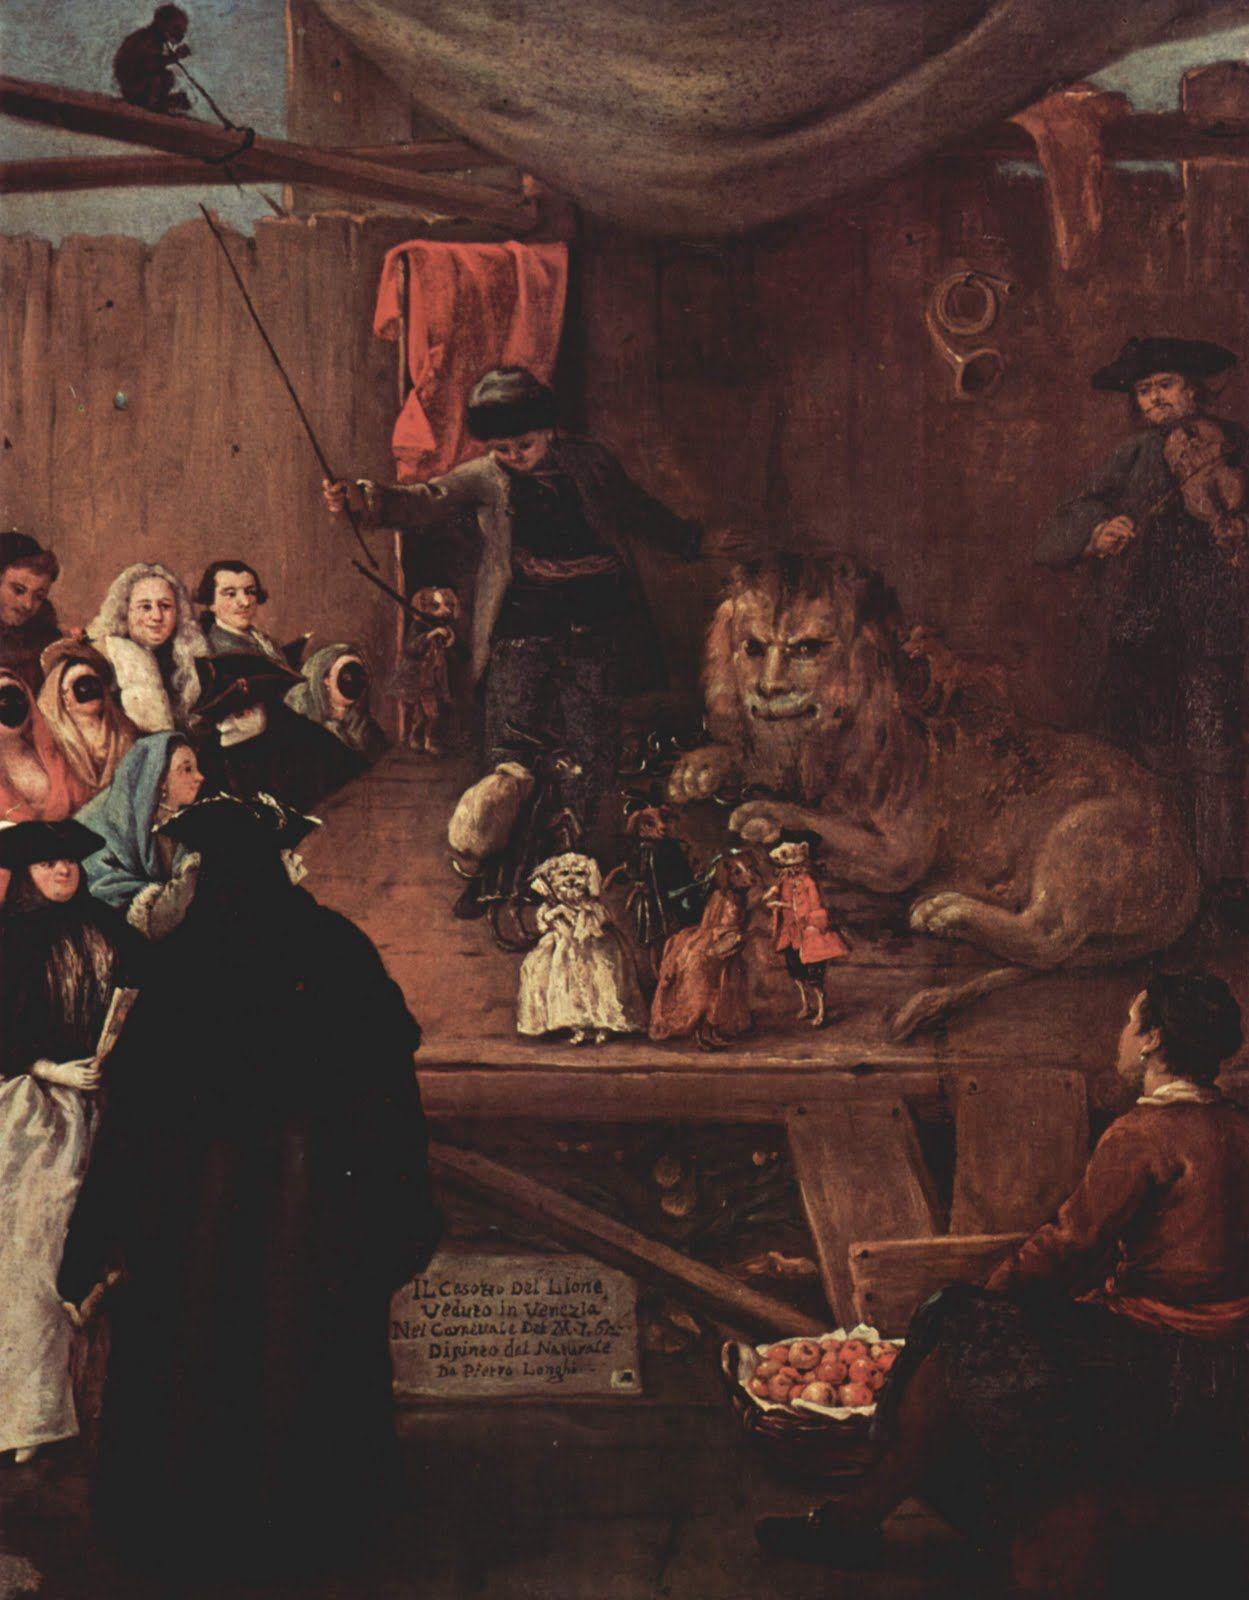 Pietro Longhi, Il casotto del leone (Die Löwenbude), 1762  https://www.artexperiencenyc.com/social_login/?utm_source=pinterest_medium=pins_content=pinterest_pins_campaign=pinterest_initial